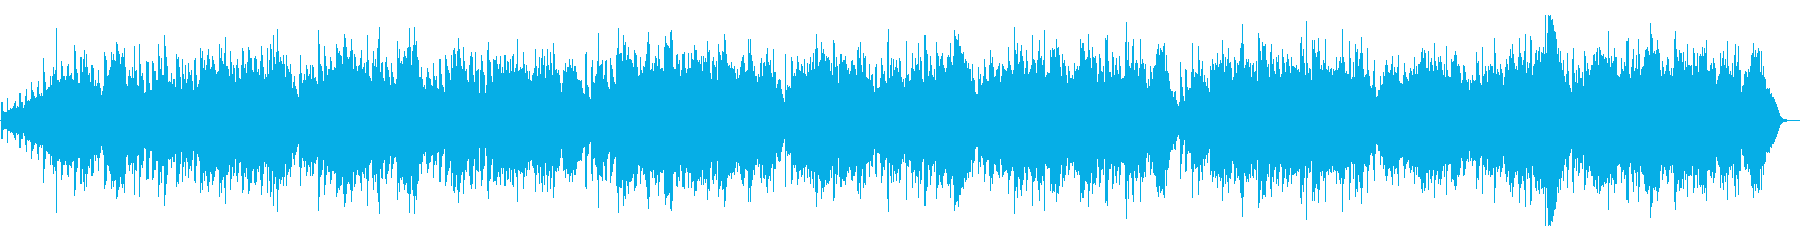 G線上のアリア(ストリングス)フルサイズの再生済みの波形